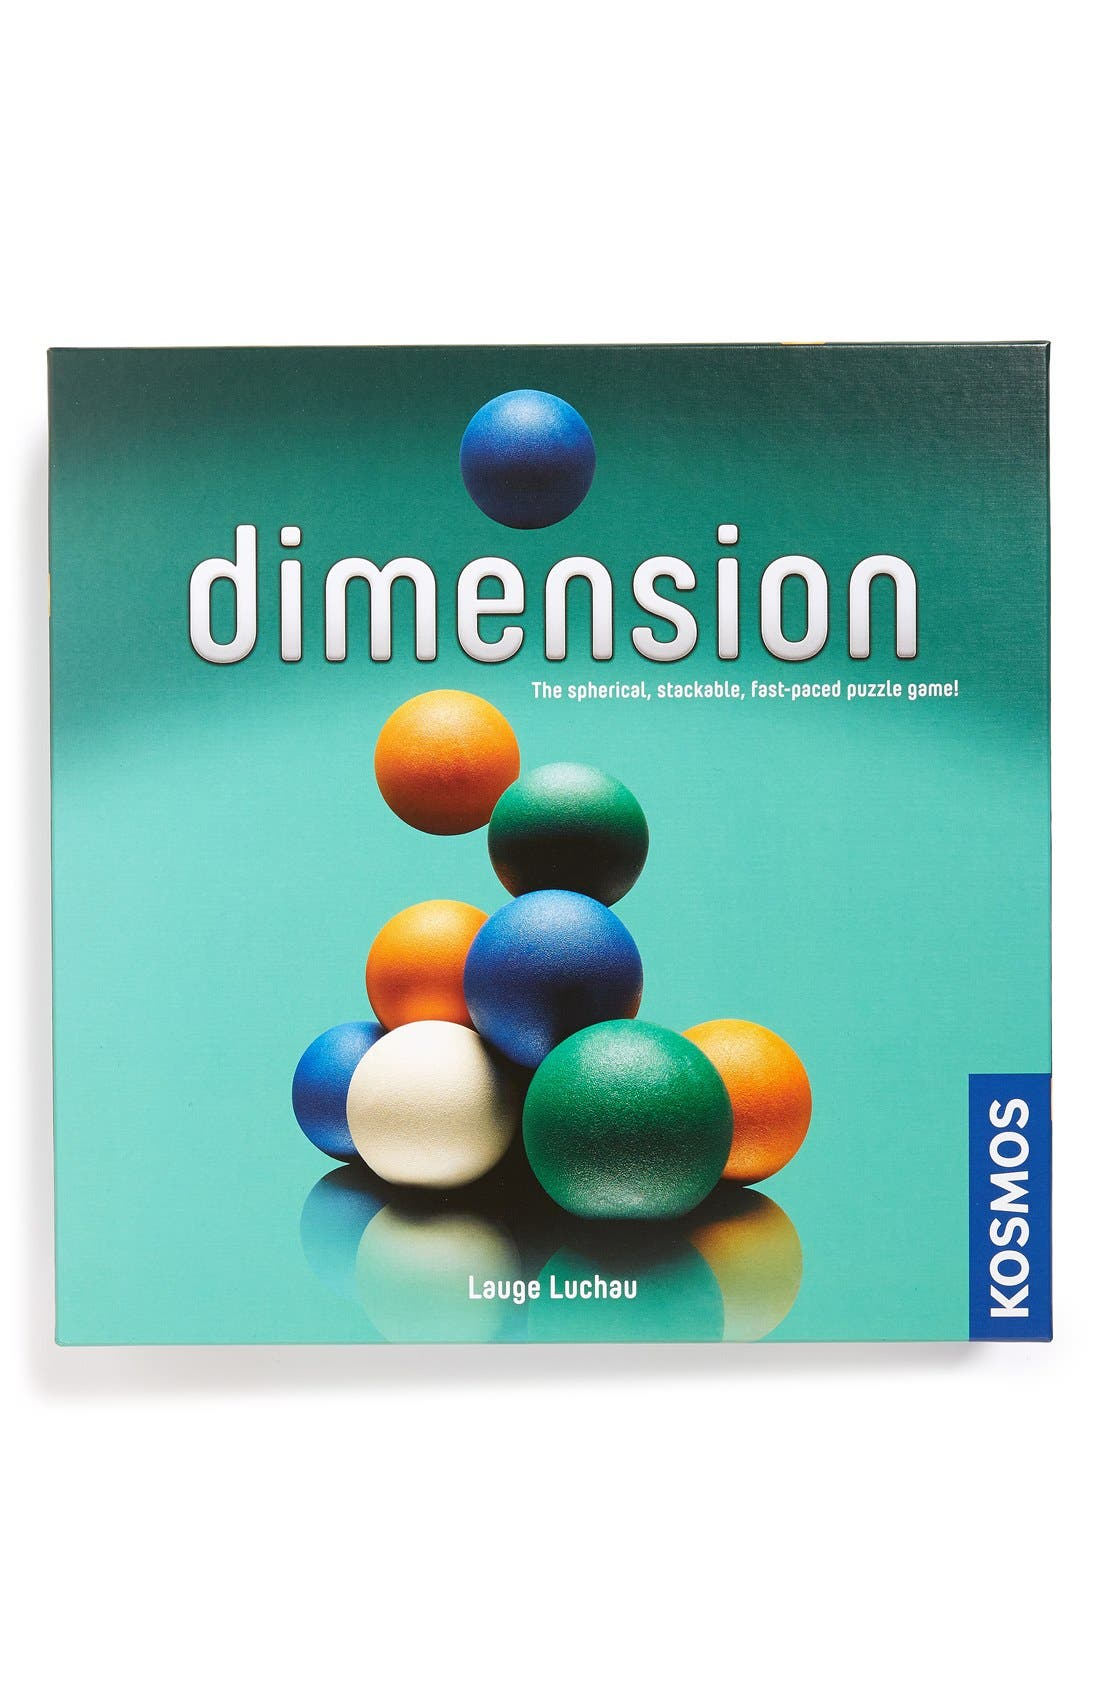 'Dimension' Spherical Puzzle Game,                             Main thumbnail 1, color,                             MULTI